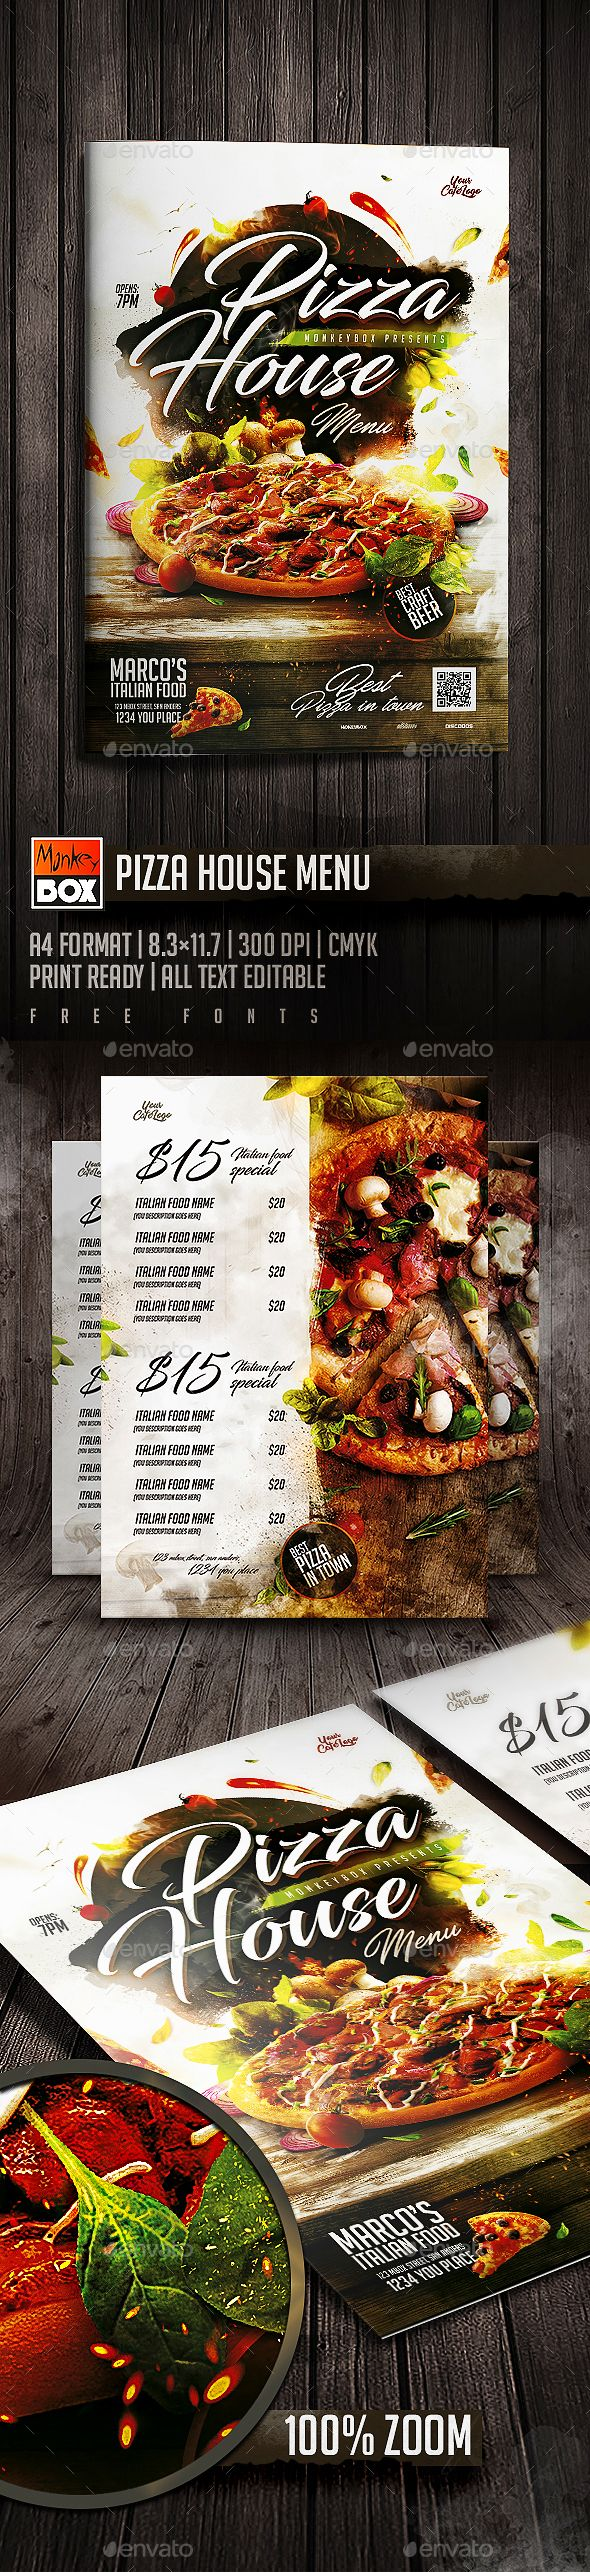 Pizza House Menu - Restaurant Flyers